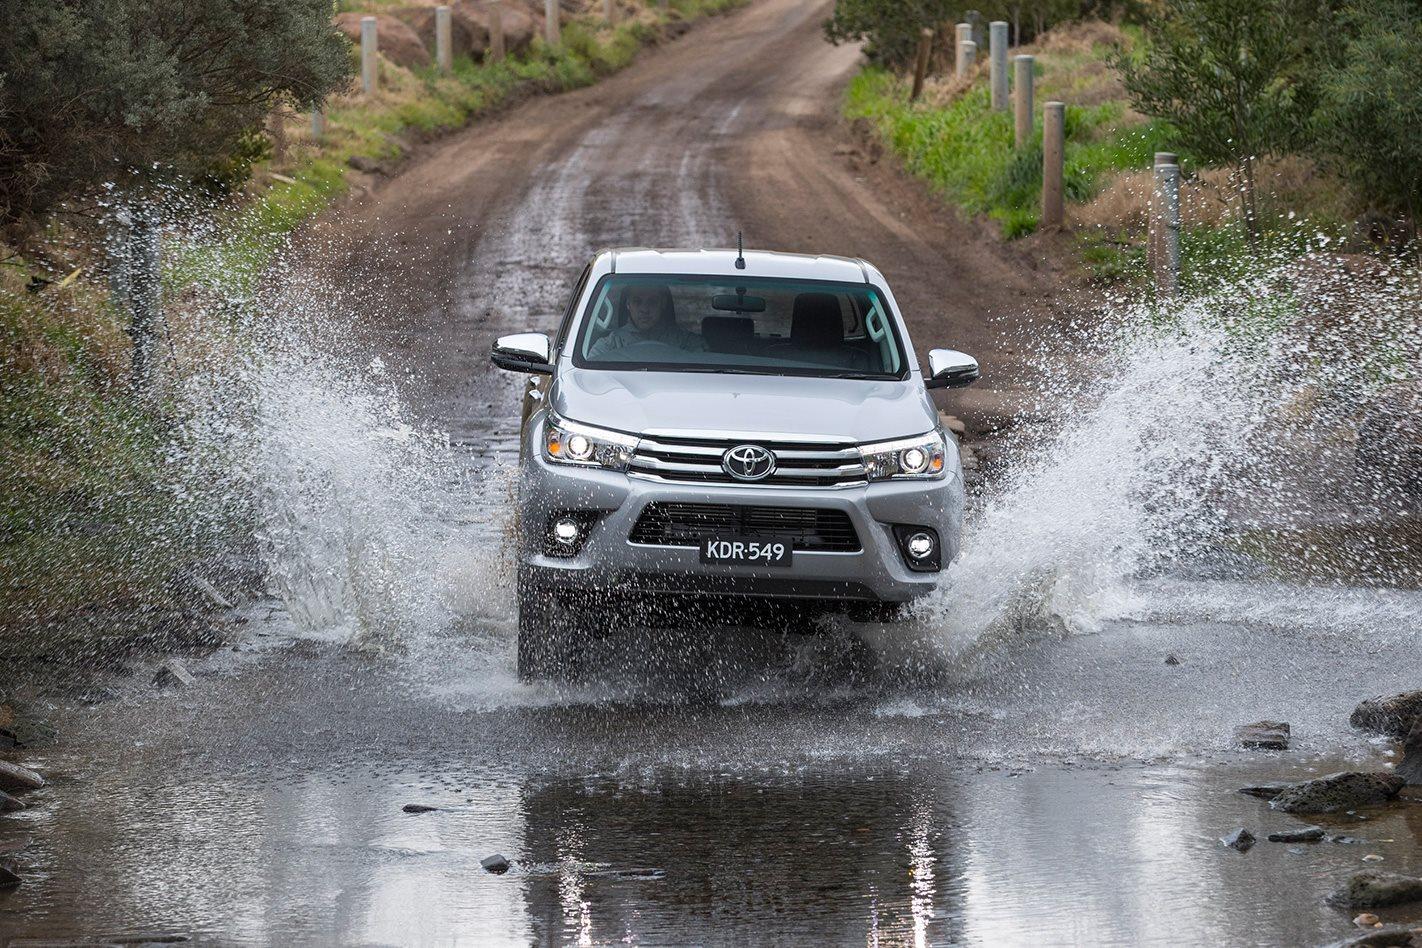 2018-Toyota-Hilux-SR5+.jpg